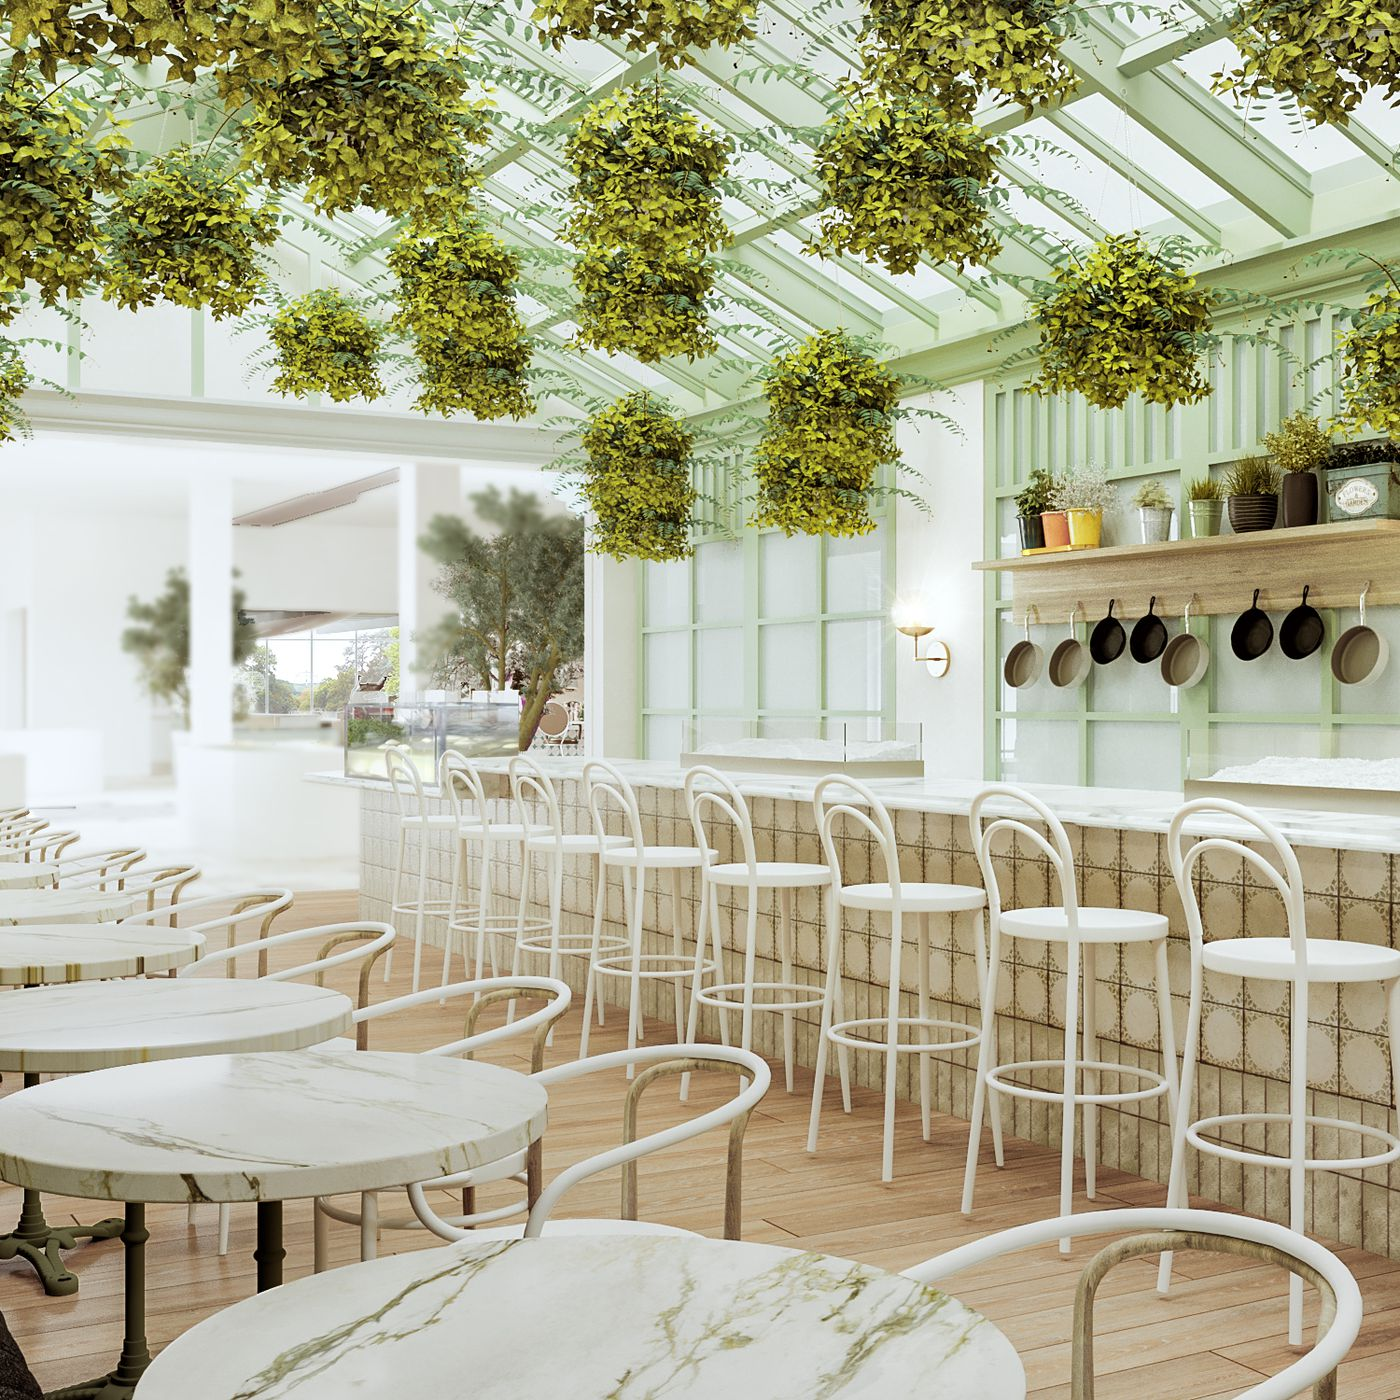 Awe Inspiring 13 Food Halls That Prove This Trends Not Dead Yet Eater Short Links Chair Design For Home Short Linksinfo